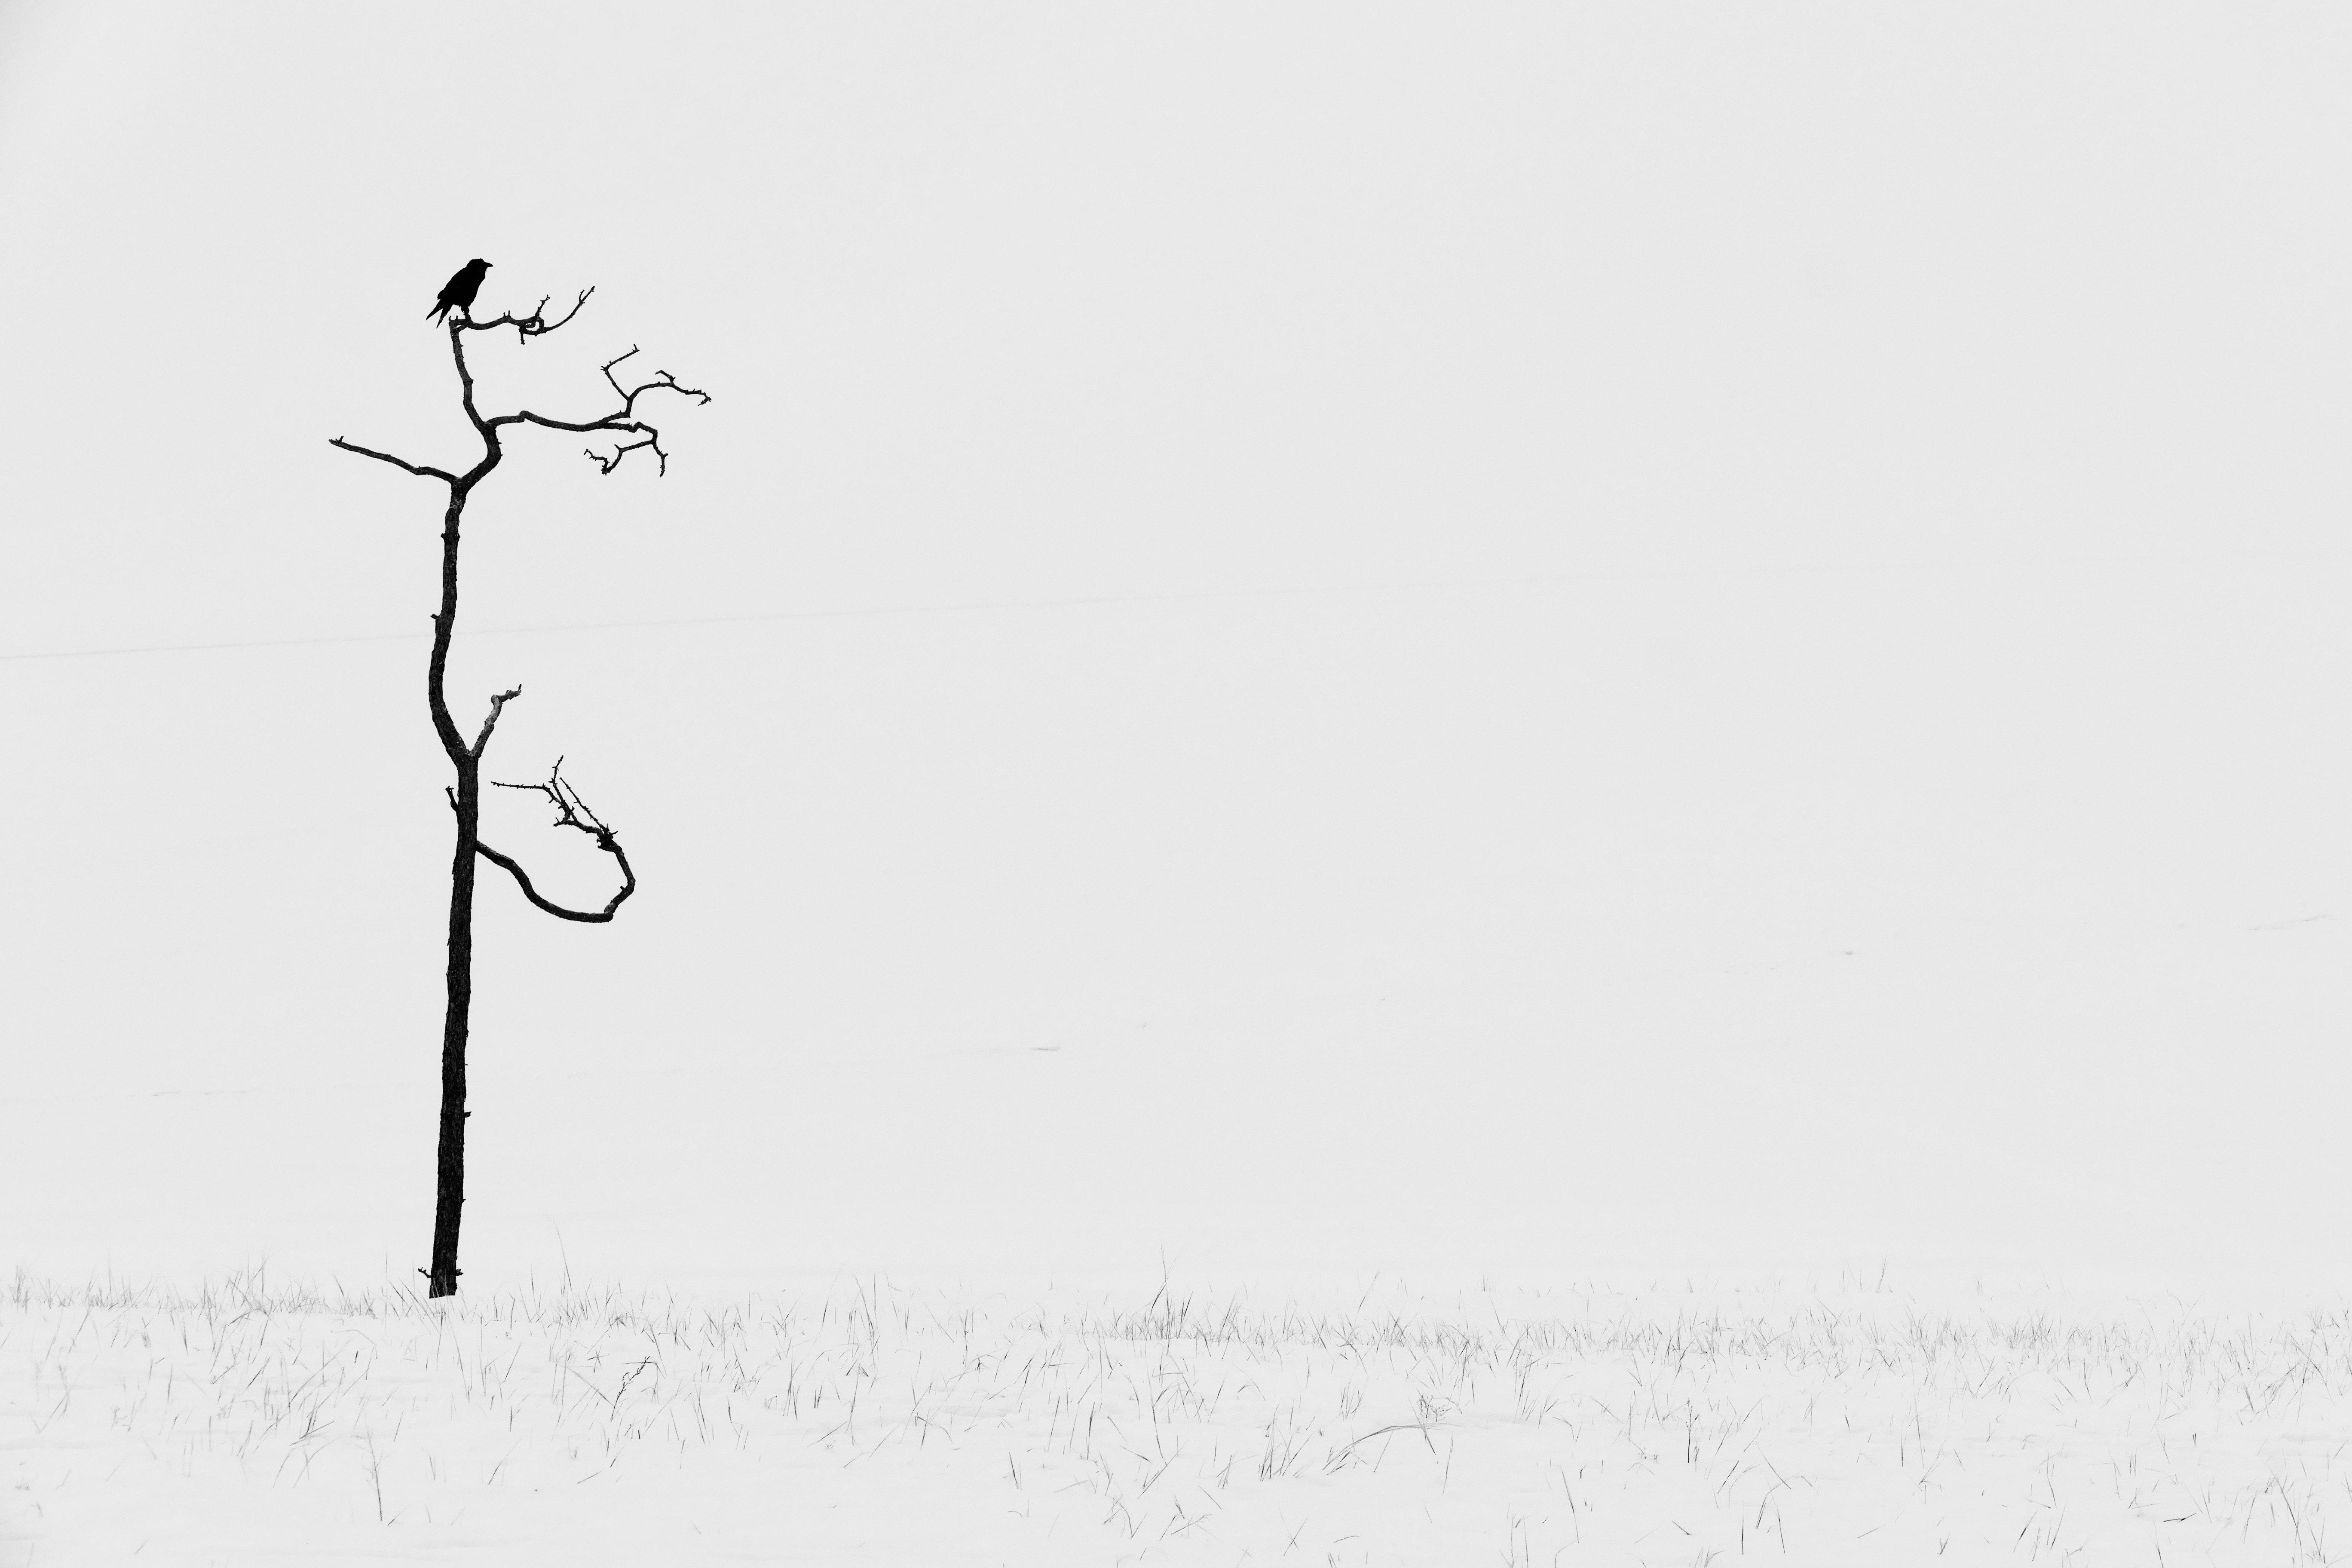 black and white, abstraction, nature, bird, tree, snow, minimalism, travel, landscape, silhouette, baikal,, Povarova Ree Svetlana